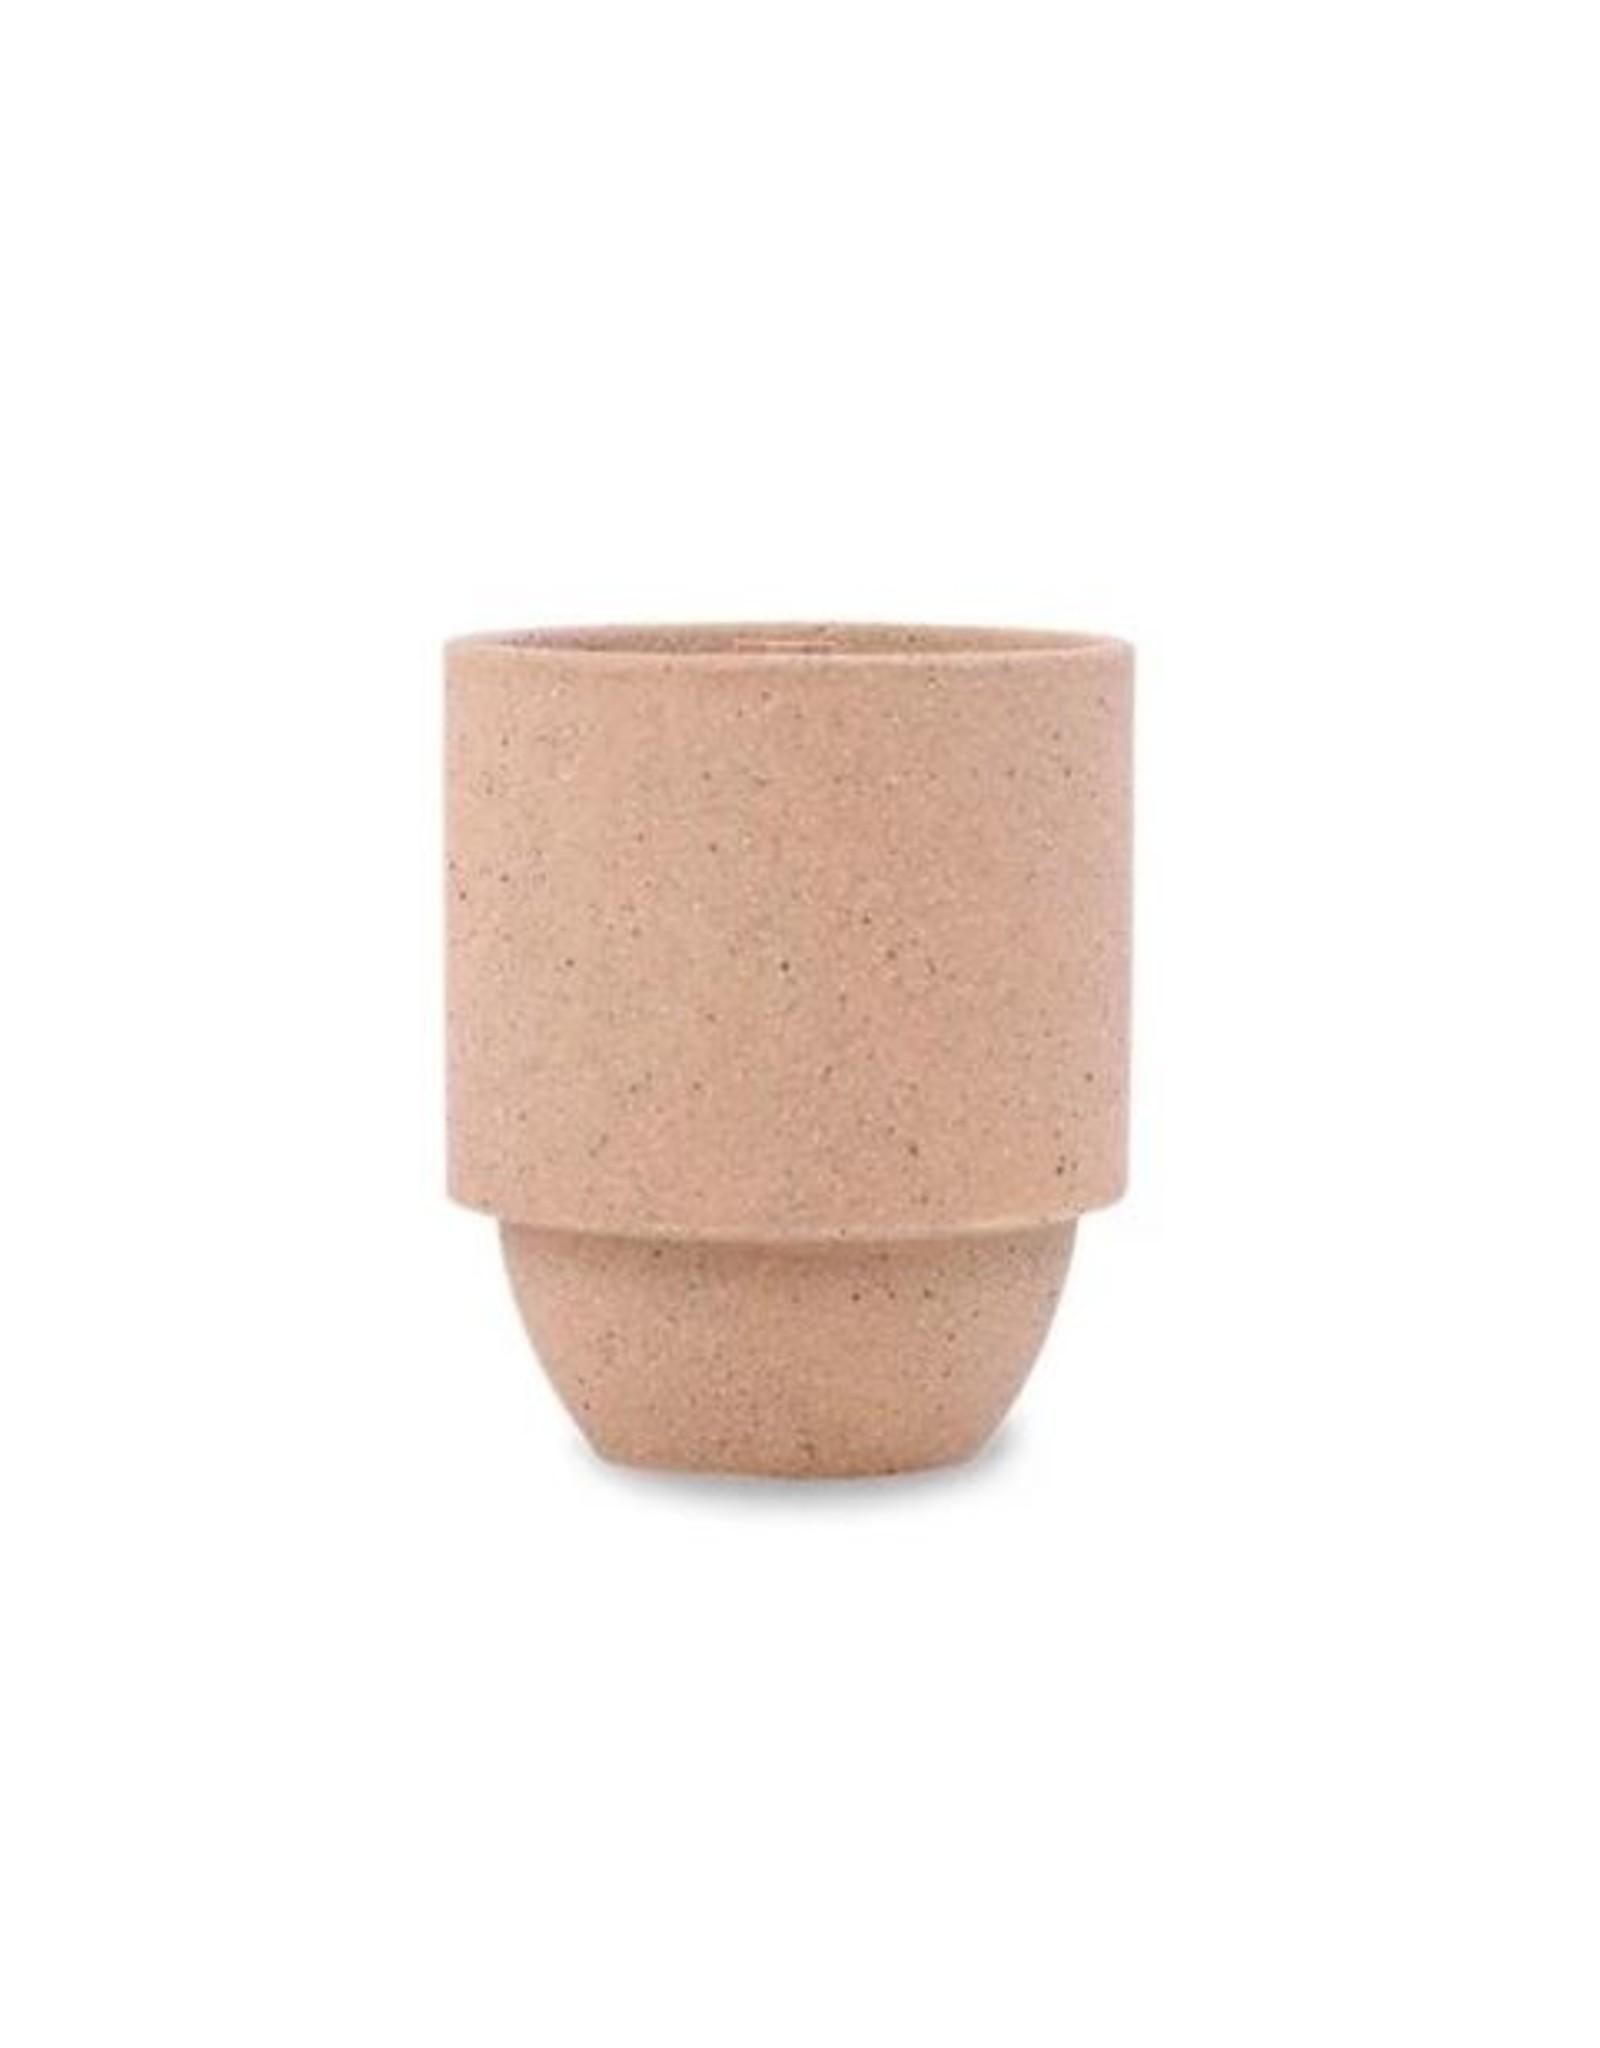 Paddywax Sagebrush + Fir Candle 11 oz